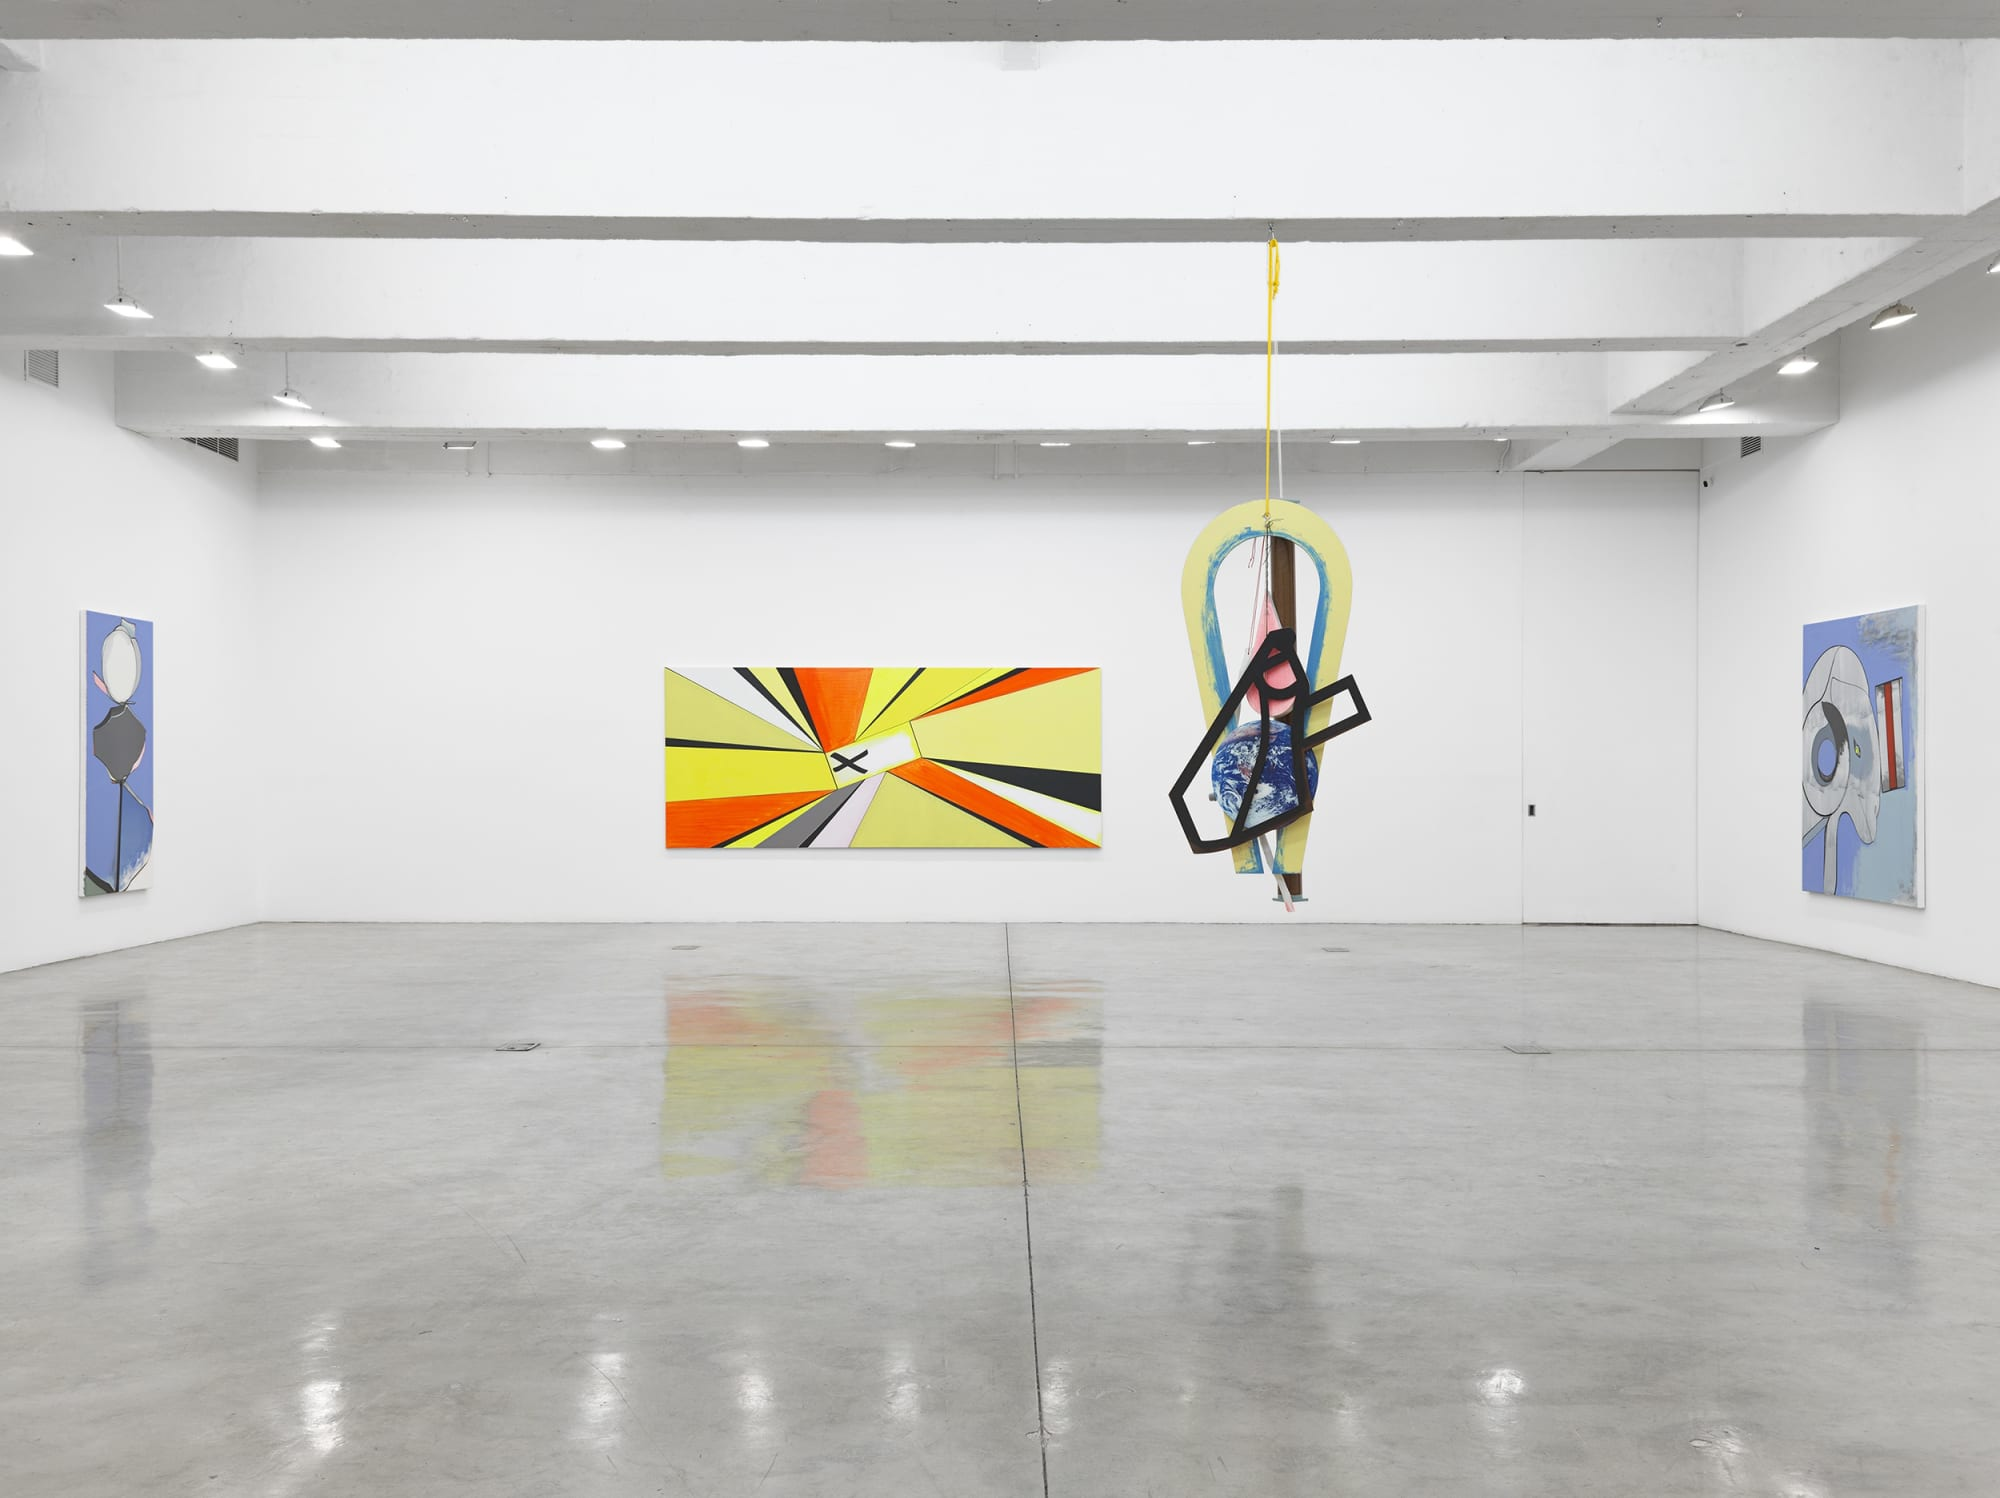 installation image of Thomas Scheibitz painting